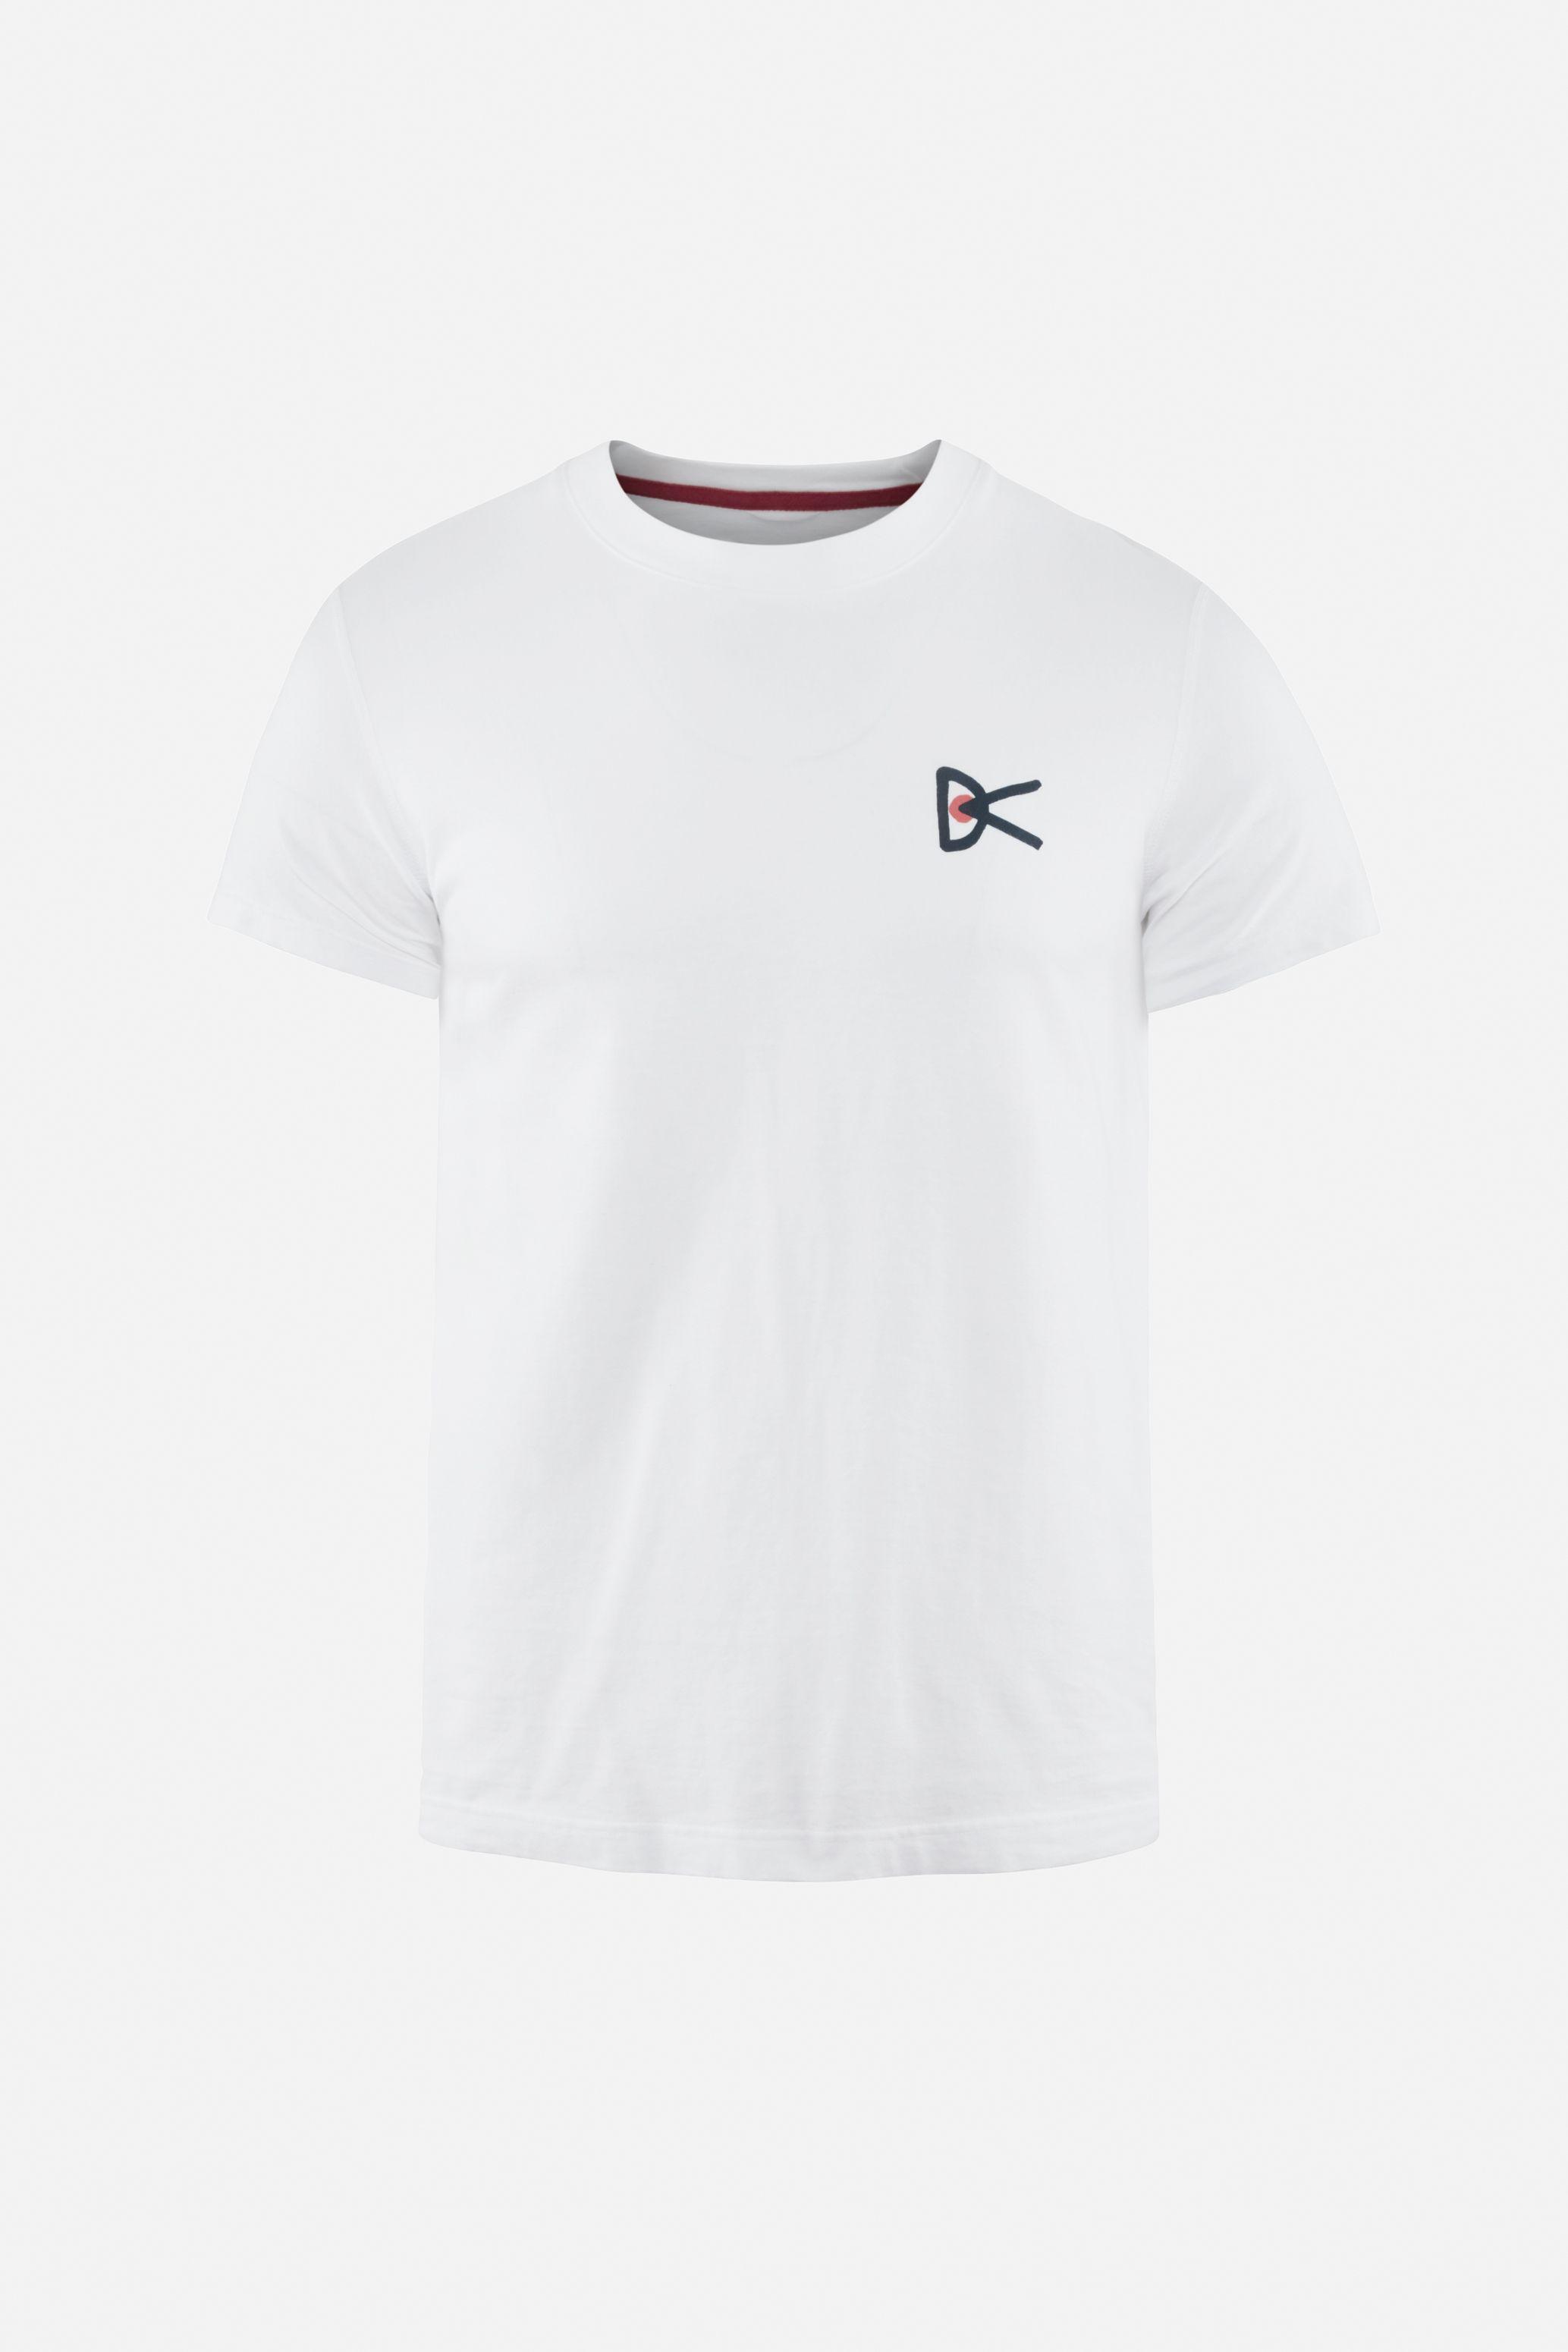 Radical Retreat Short Sleeve T-Shirt, White